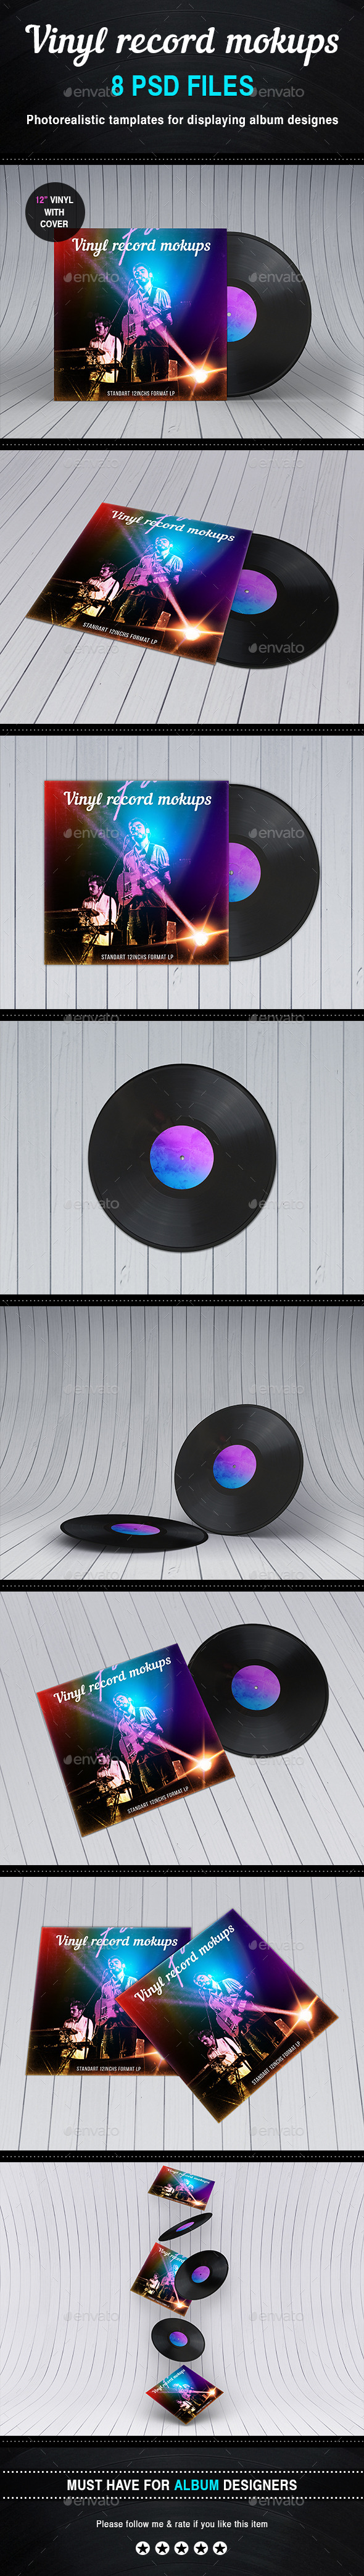 GraphicRiver Vinyl Record Album Mock-ups 10839818